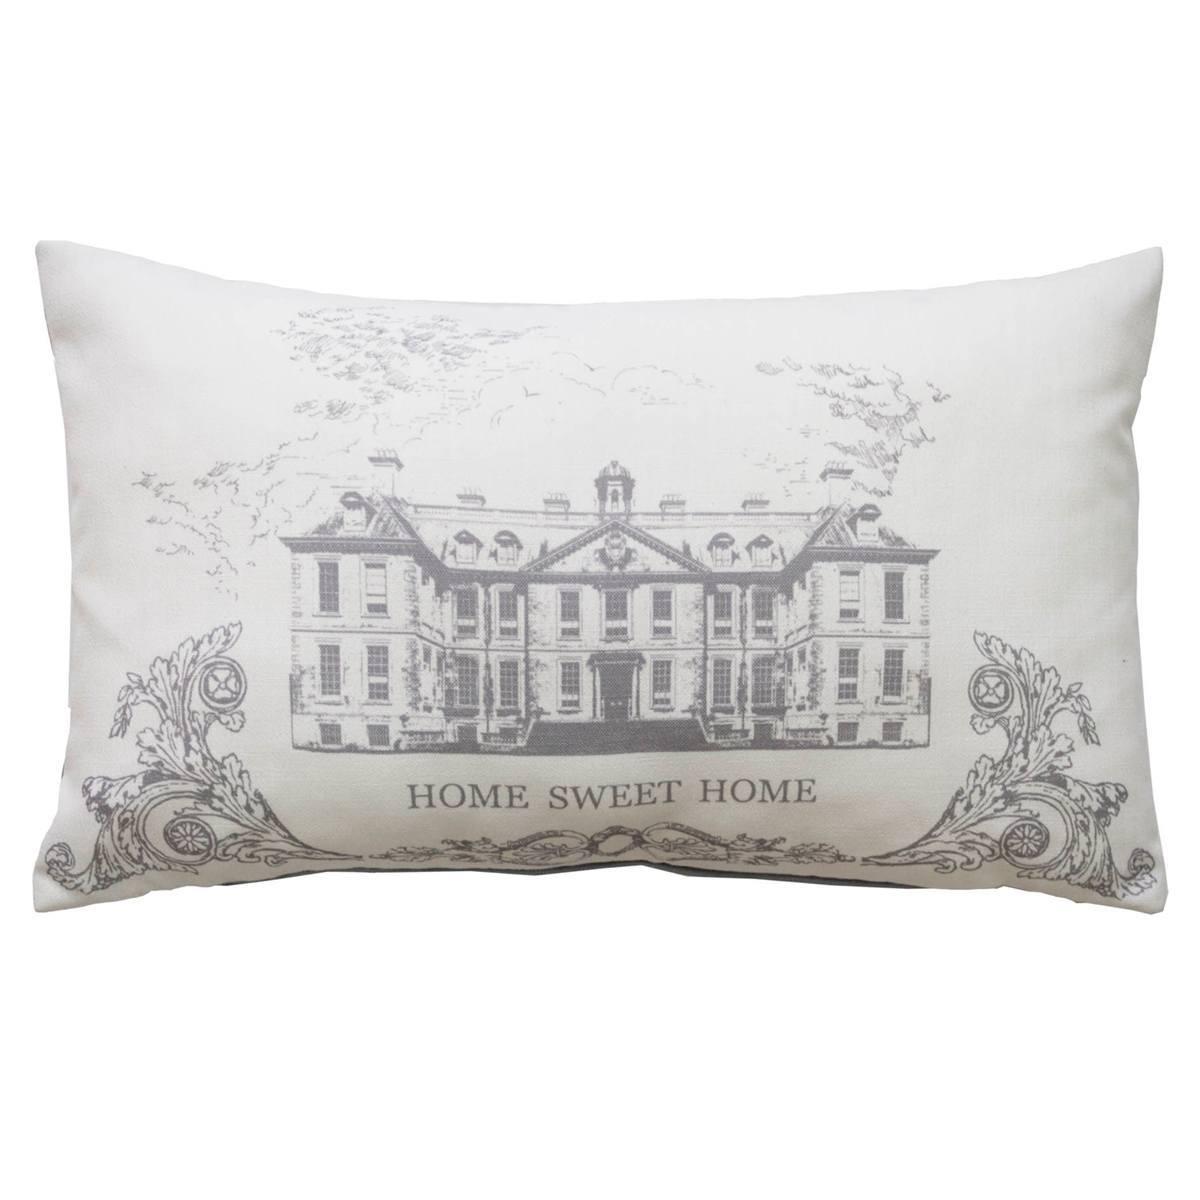 Pebble Kirstie Allsopp Louisa Filled Cushion